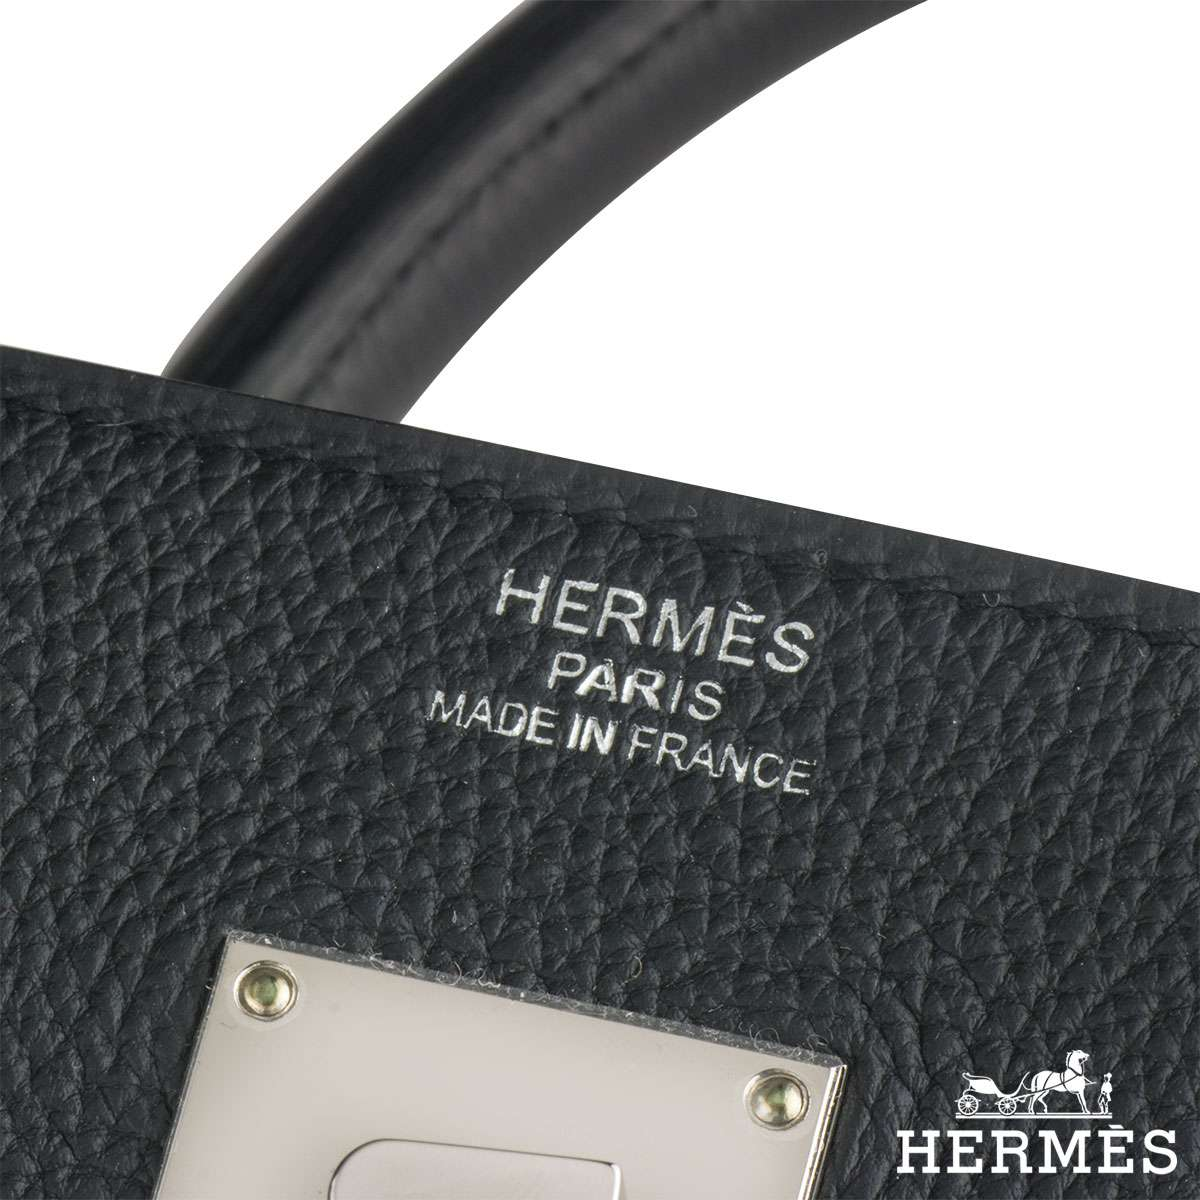 Hermès Togo 40cm HAC Birkin Bag